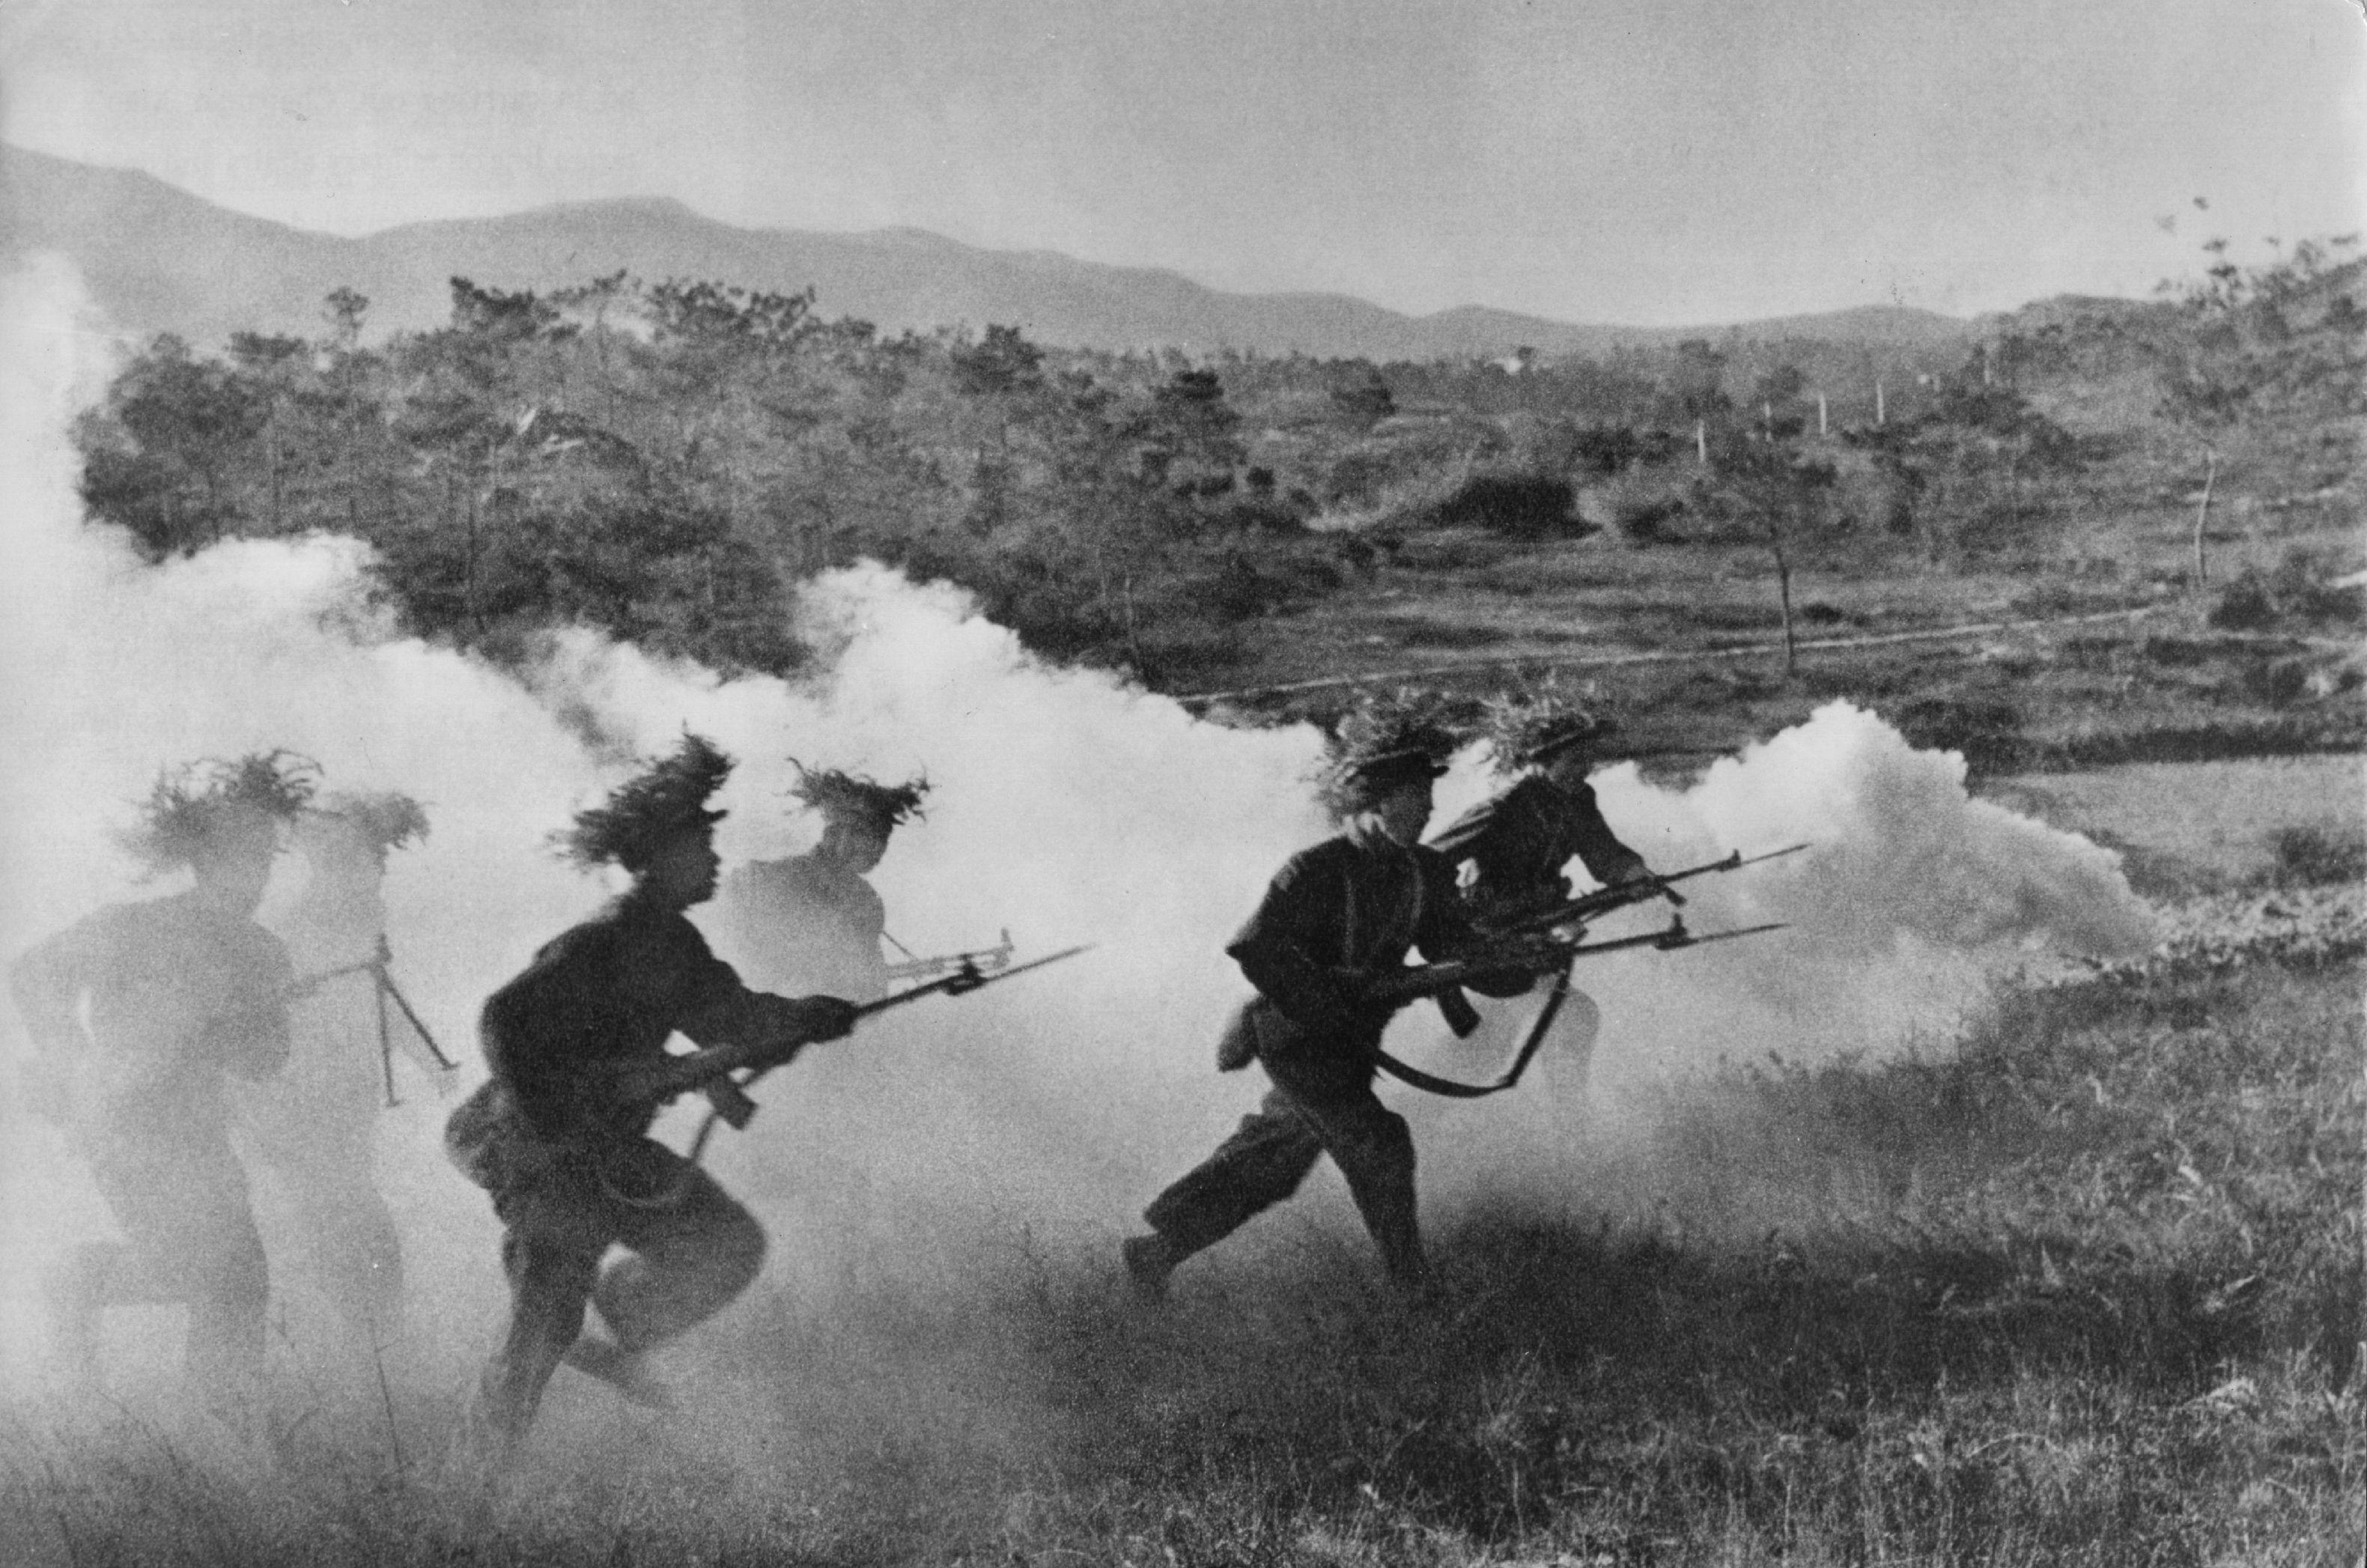 world war ii research topics for homework essays why was so aggressive in world war ii